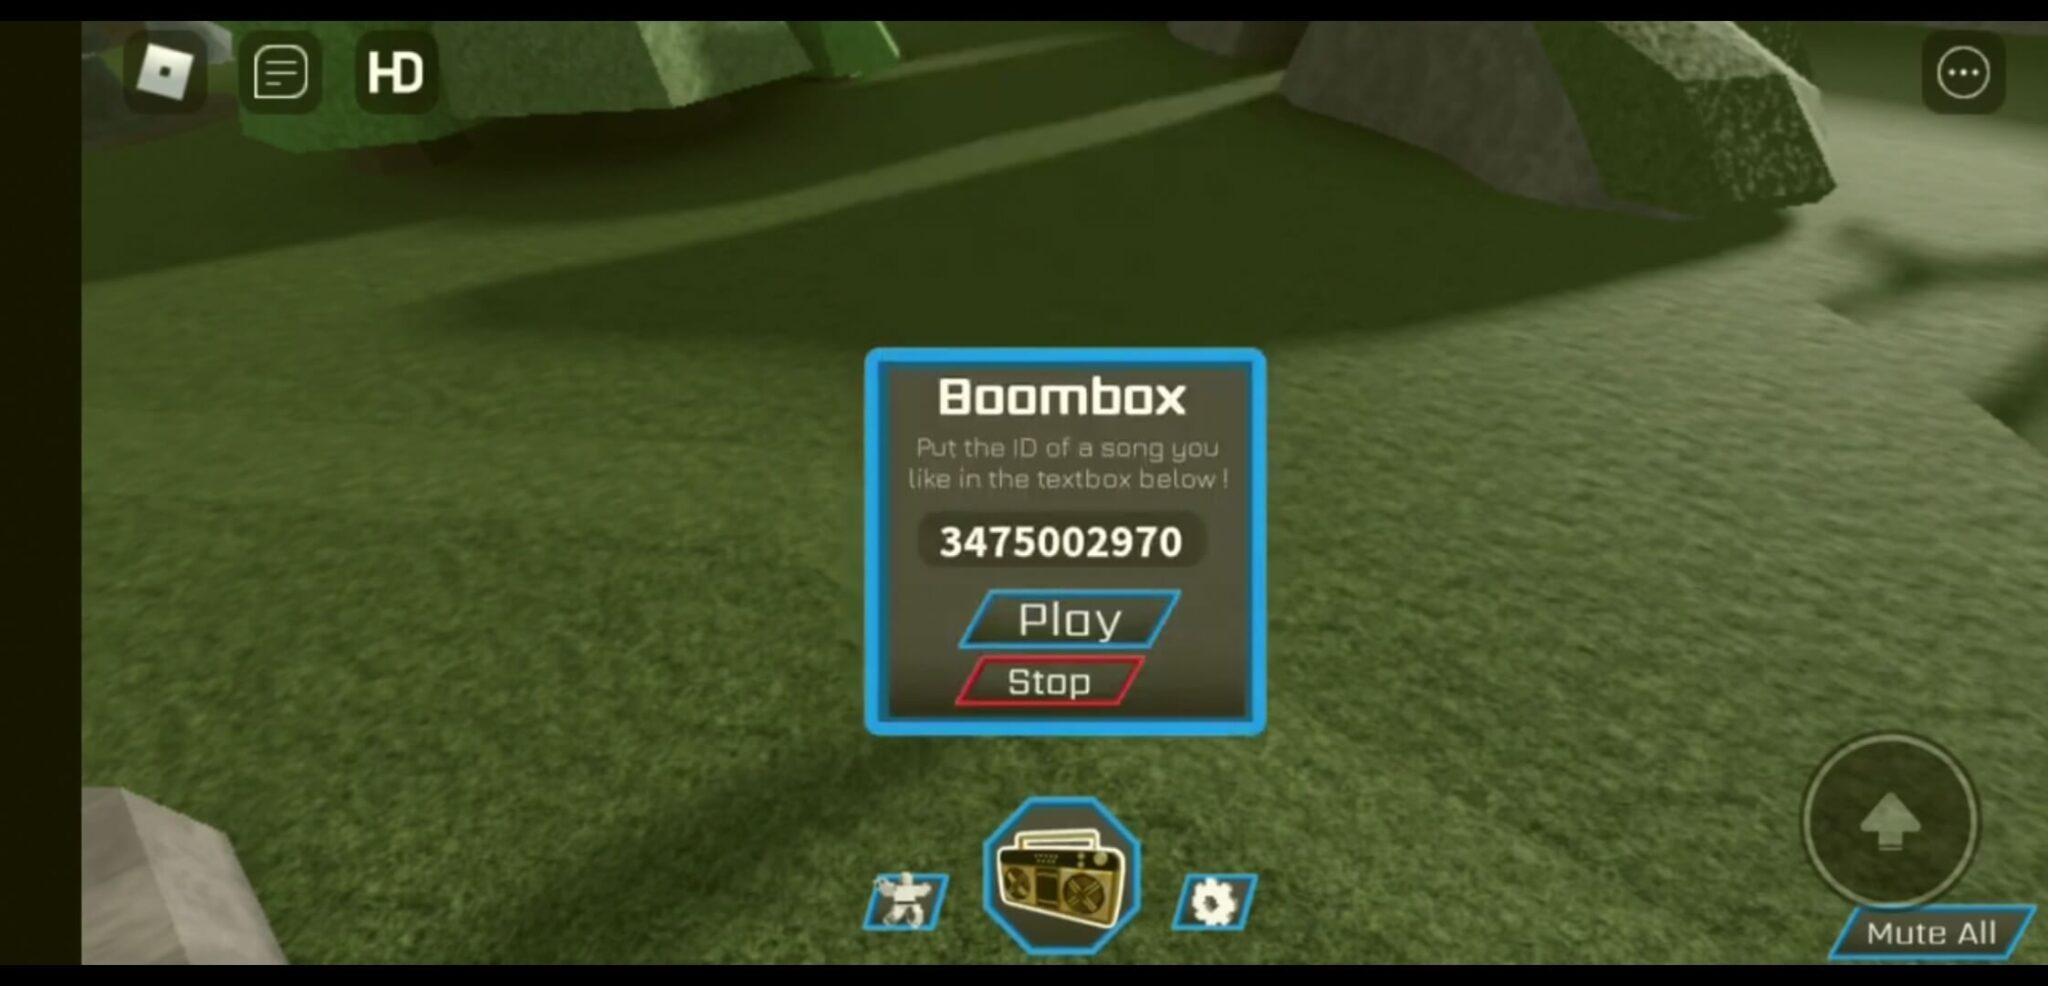 roblox-boombox-codes